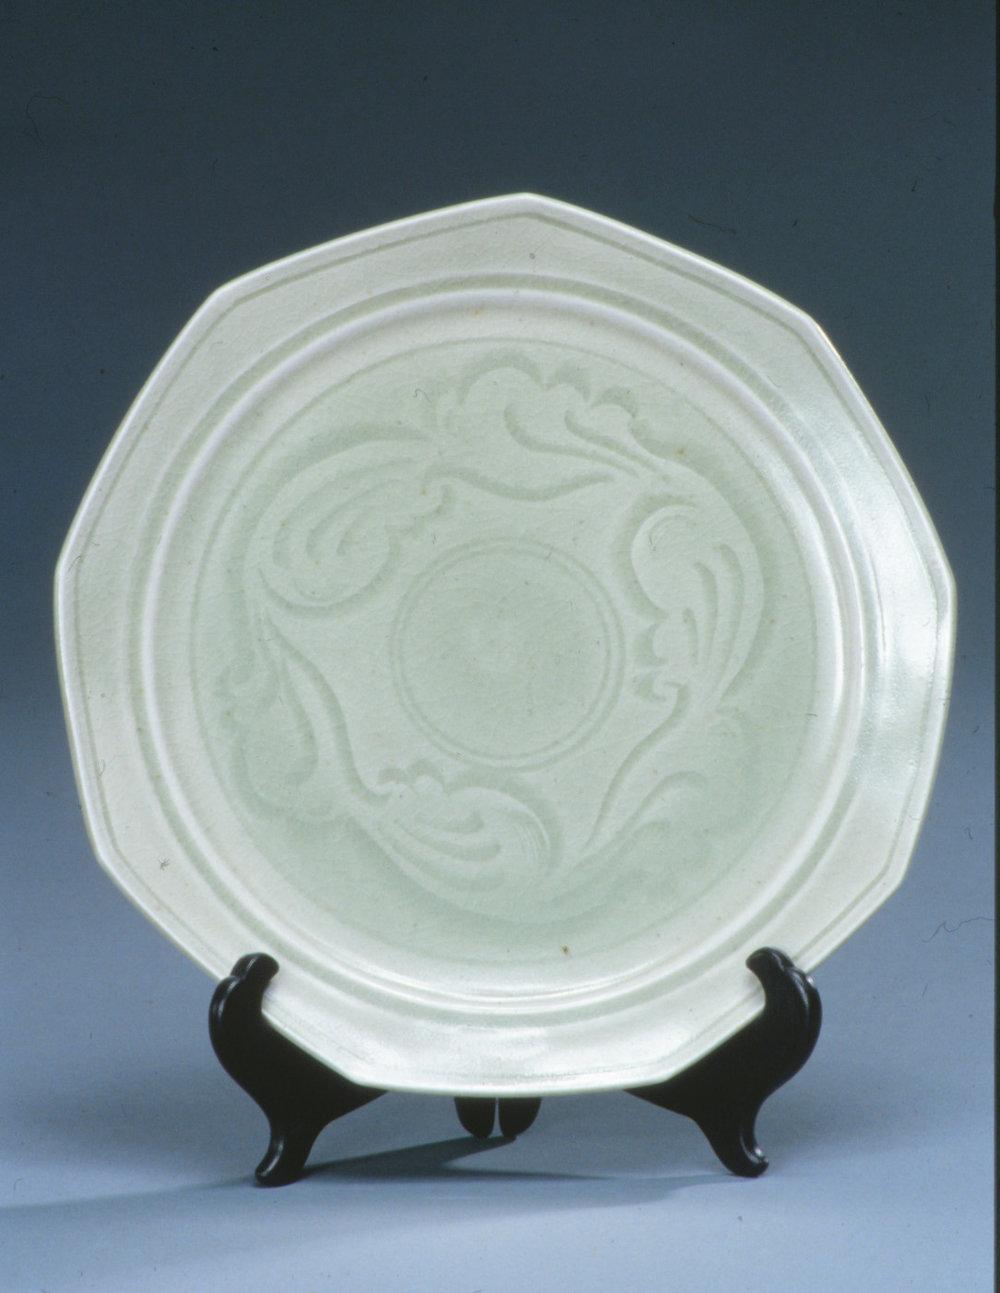 Carved porcelain plate with Northern celadon glaze